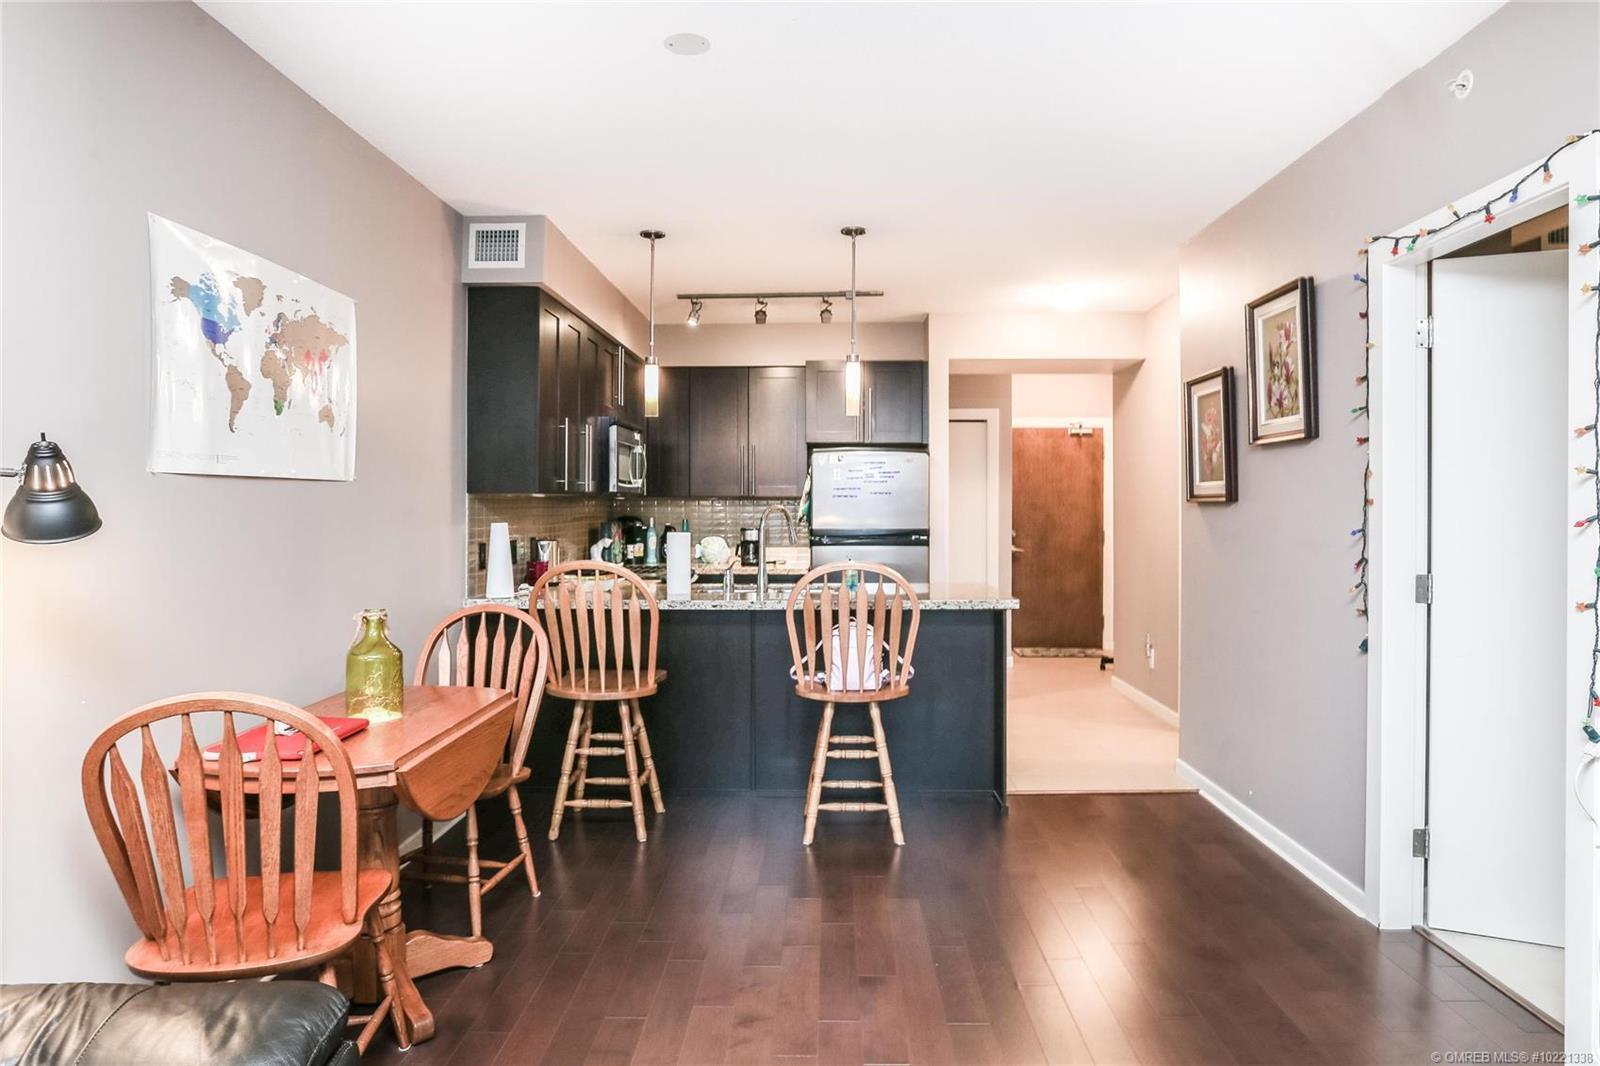 #404 1075 Sunset Drive, - Kelowna Apartment for sale, 1 Bedroom (10221338) - #6